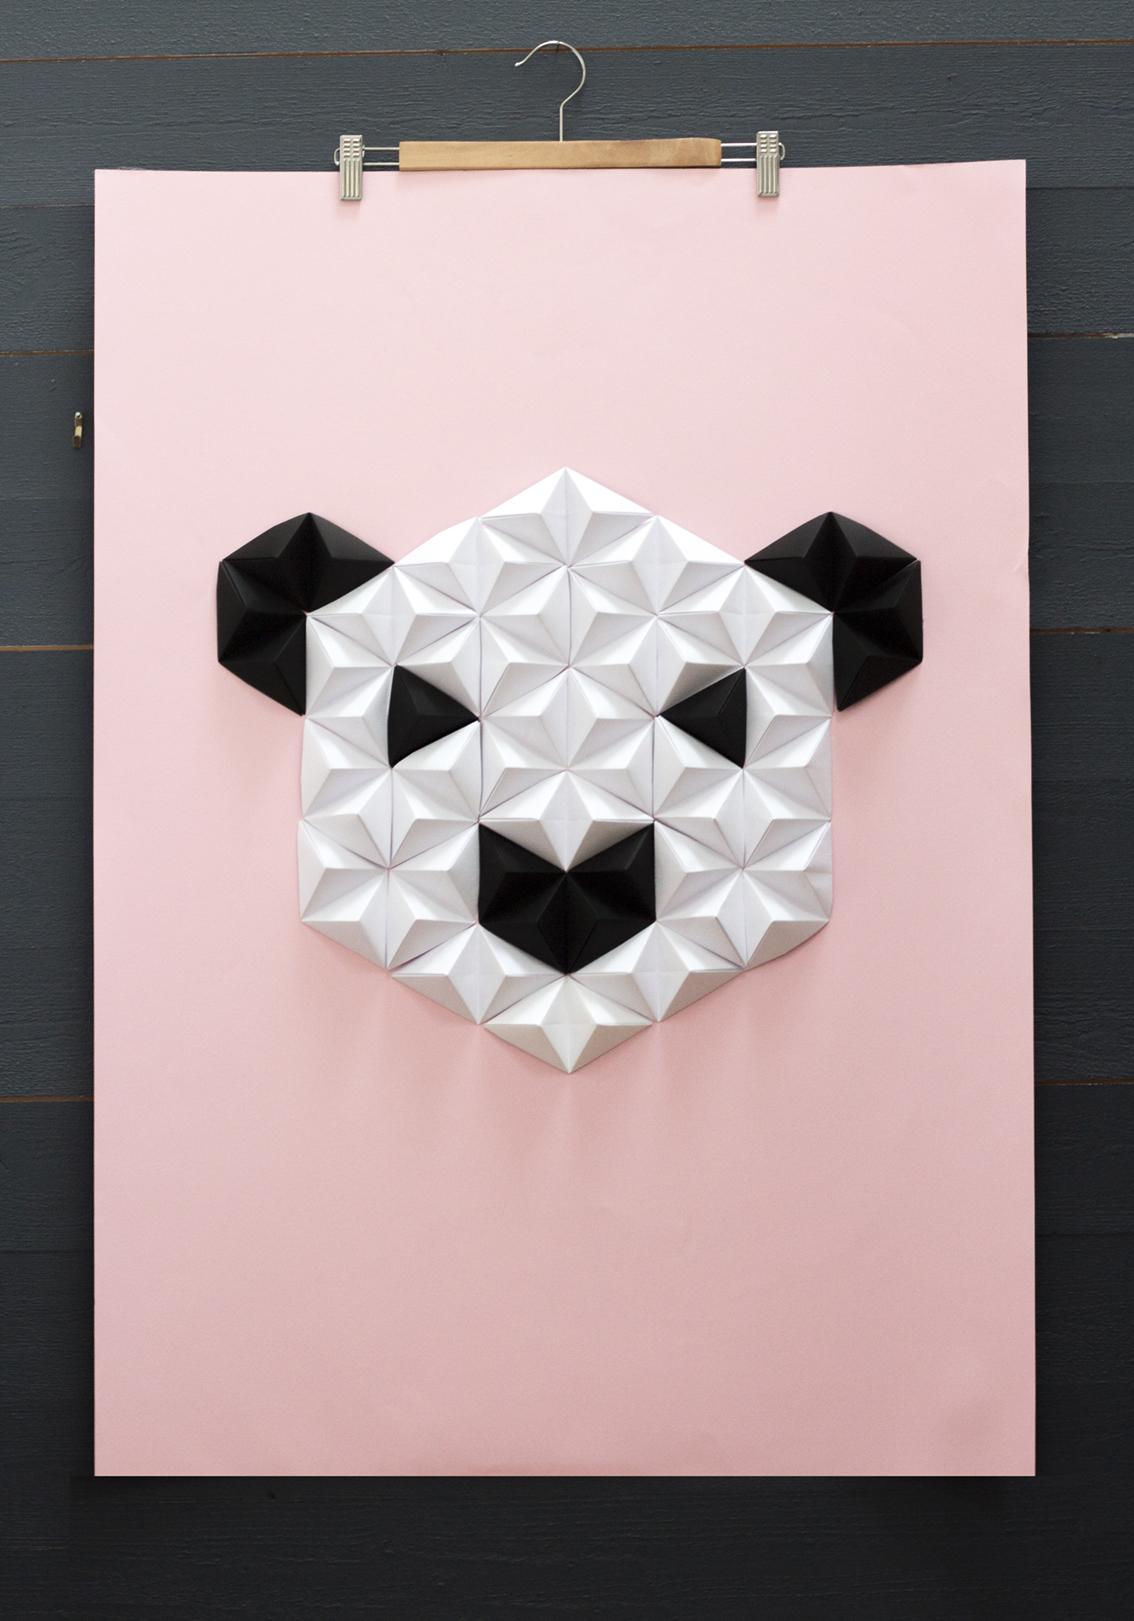 Isbjörnstavla | Pysselbolaget